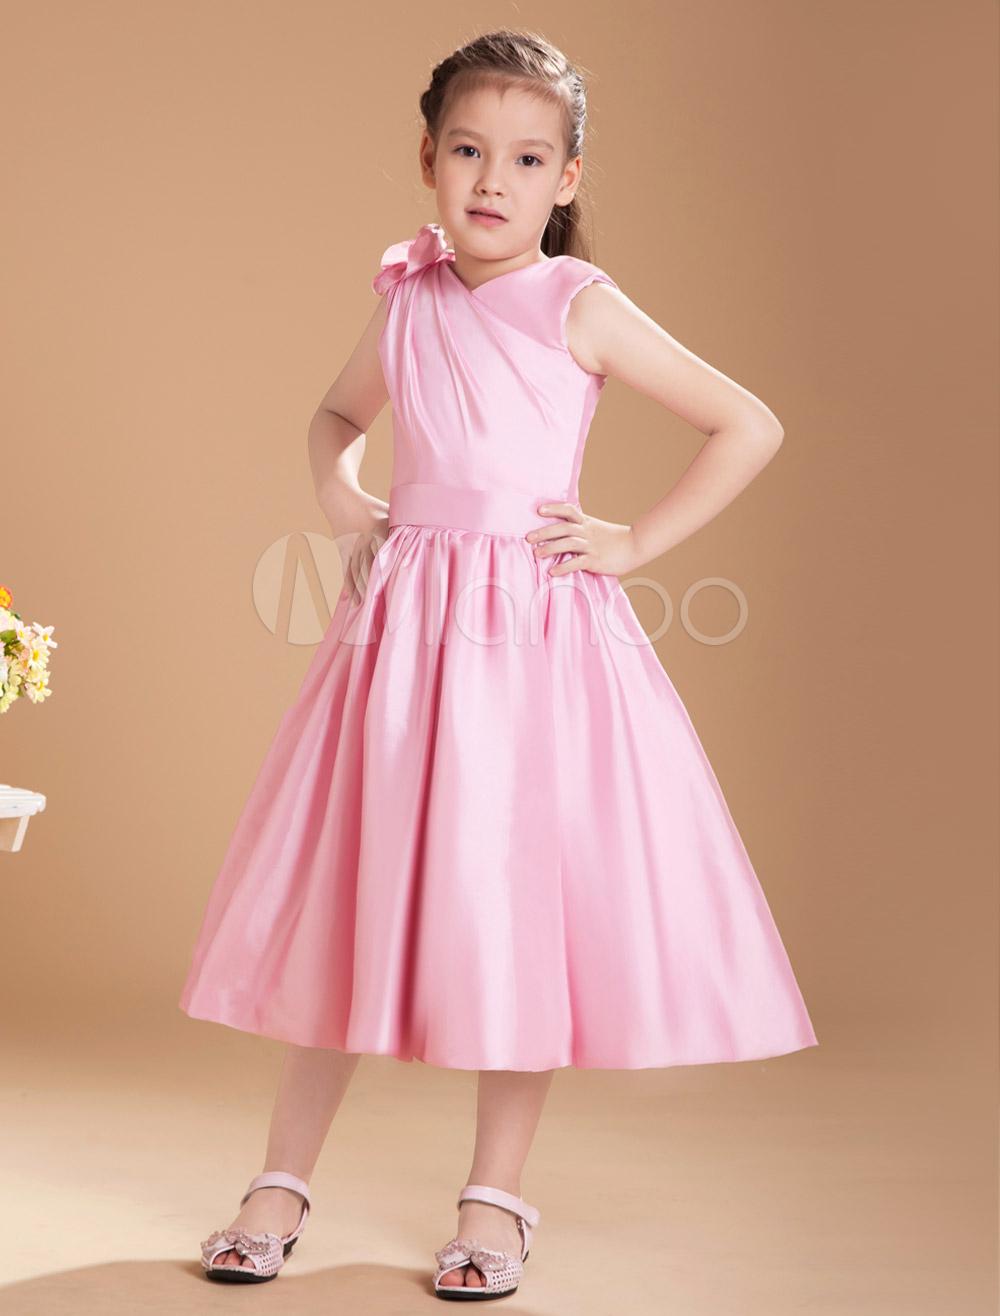 ef5c122fba6be ... Lovely Pink Taffeta V-neck Knee Length Junior Bridesmaid Dress-No.7.  12. Color: AddThis Sharing Buttons